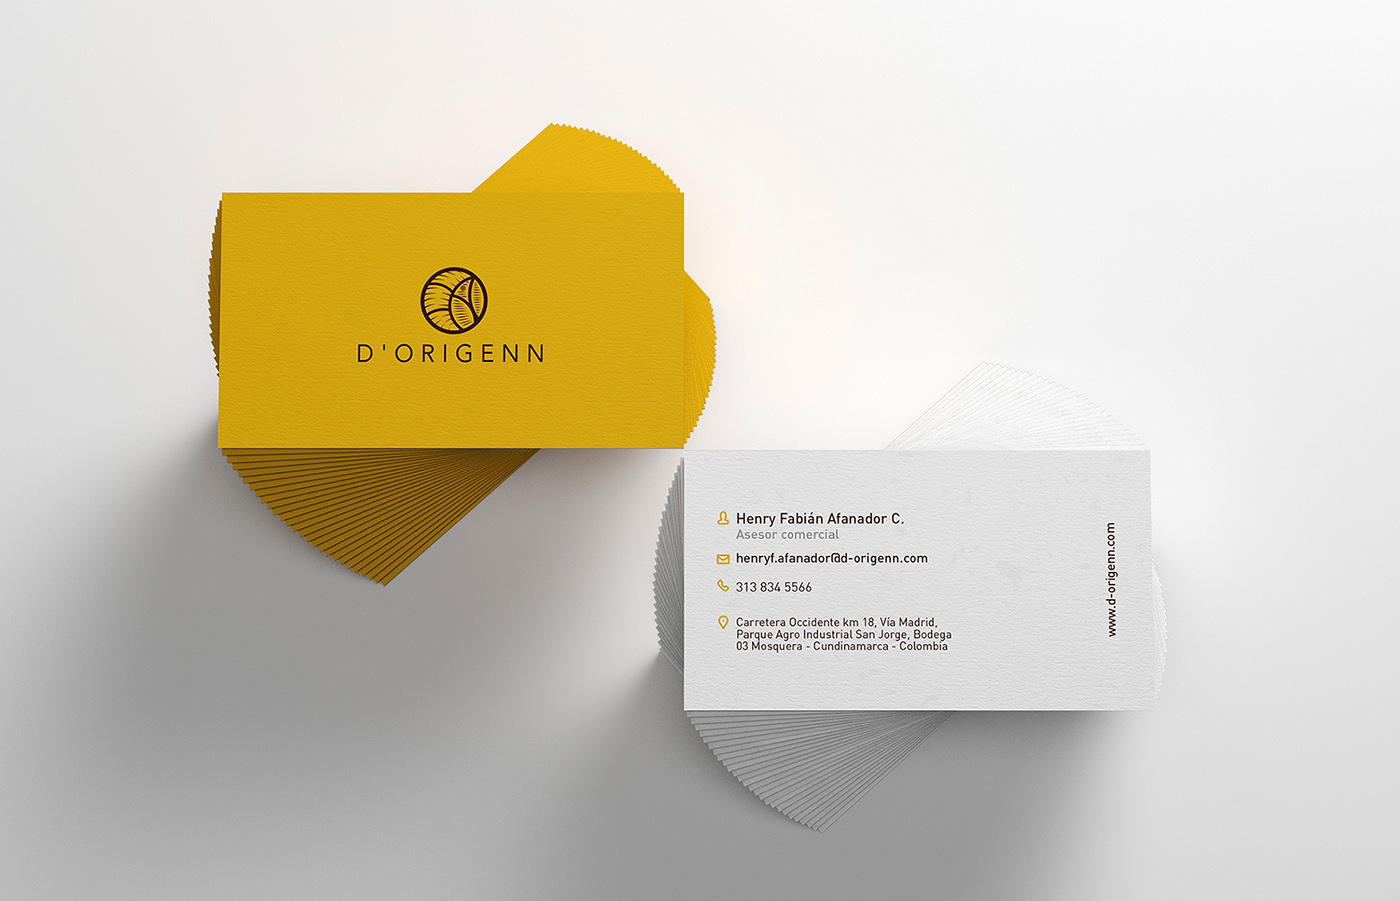 logo Coffee colombia ilustration david espinosa Dorigenn